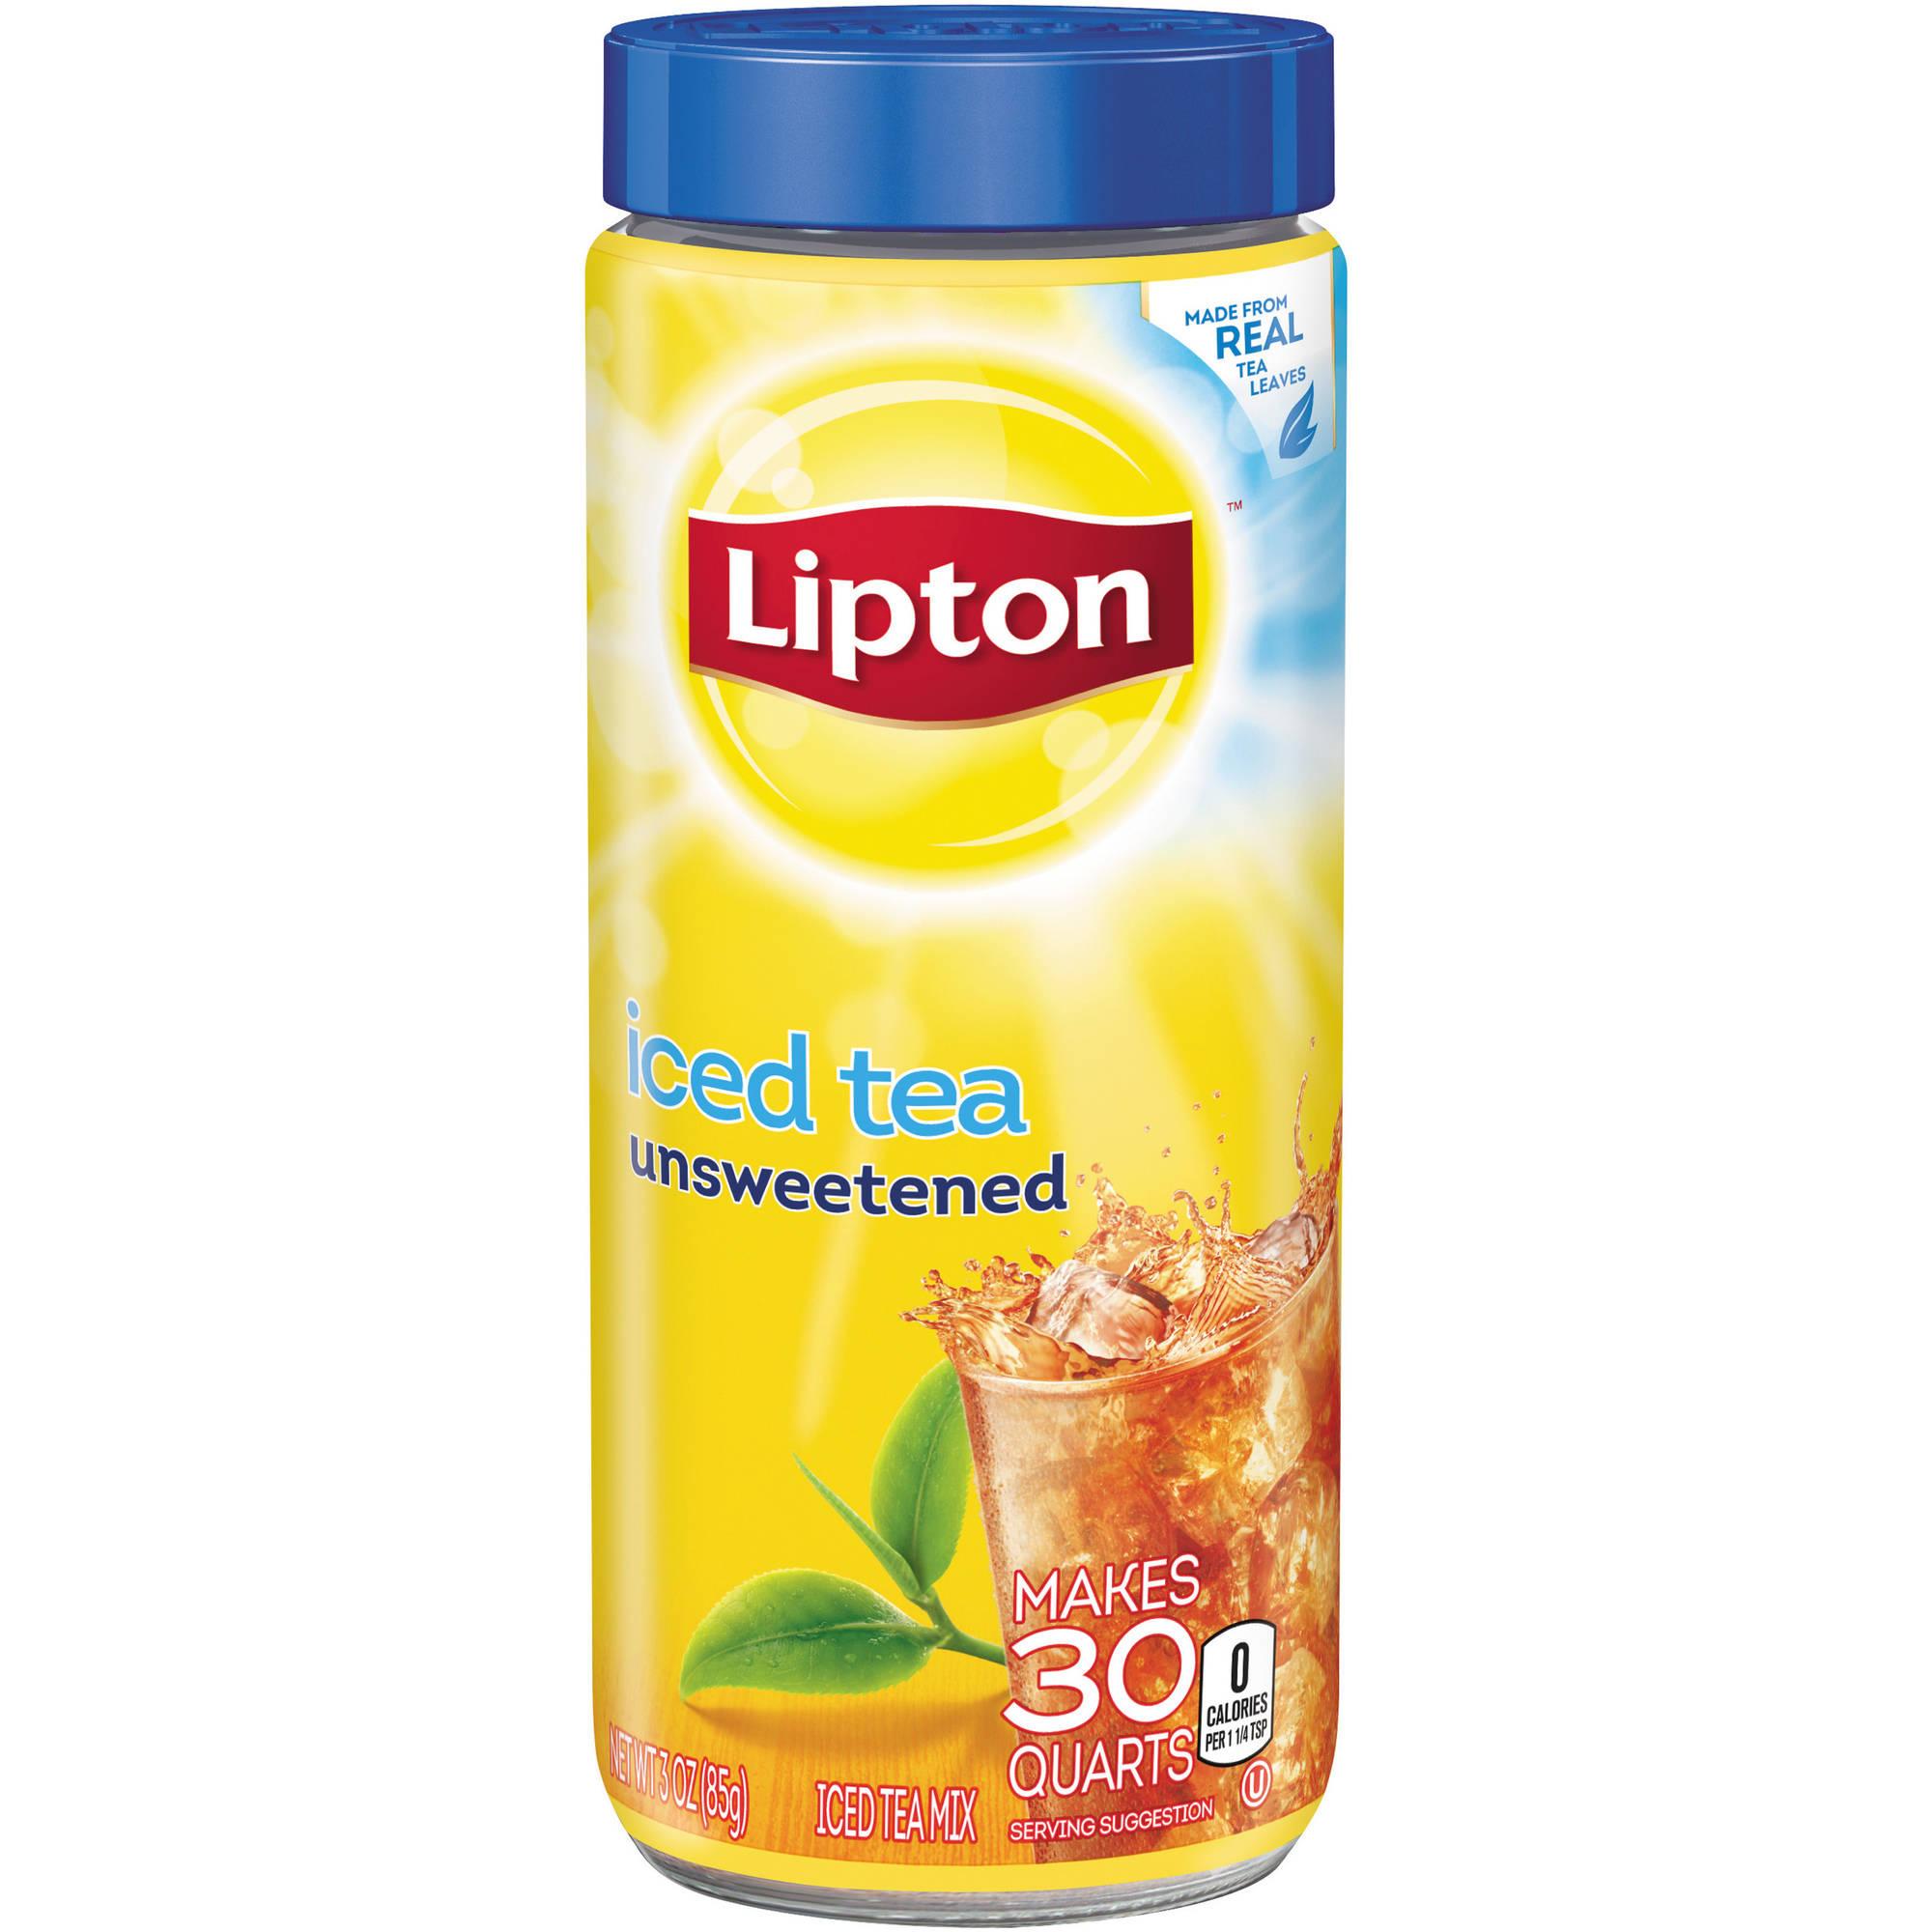 Lipton Drink Mix, Black Iced Tea, 3 Oz, 1 Count